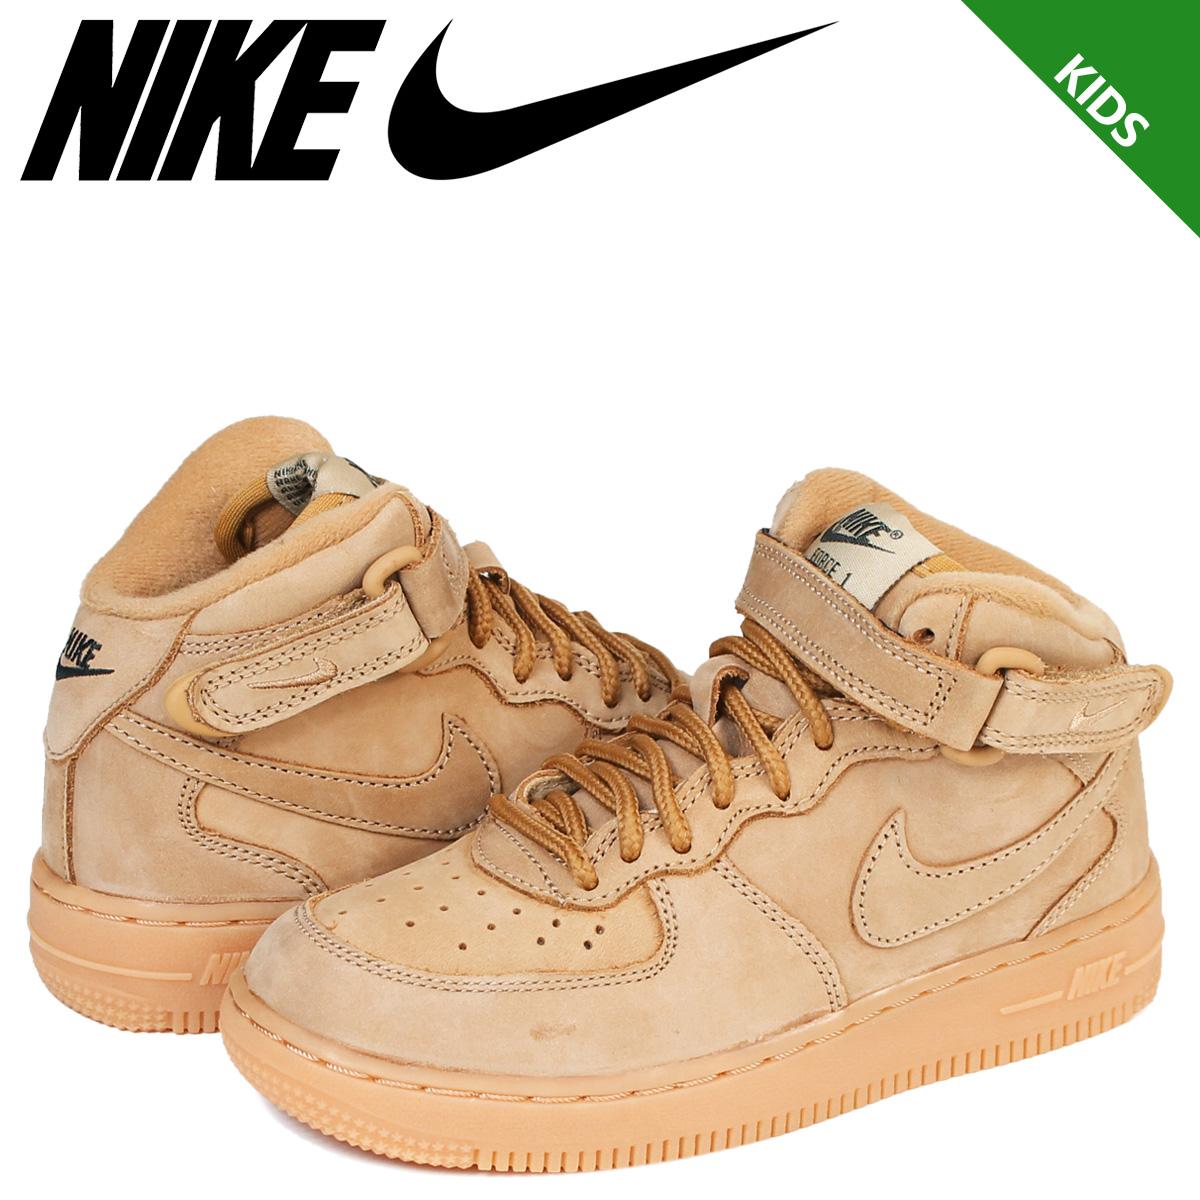 Nike Shoes Wb Mid 203 Ah0756 Brown928 Load Force Kids Shinnyu 1 Ps Air Sneakers R34AL5j